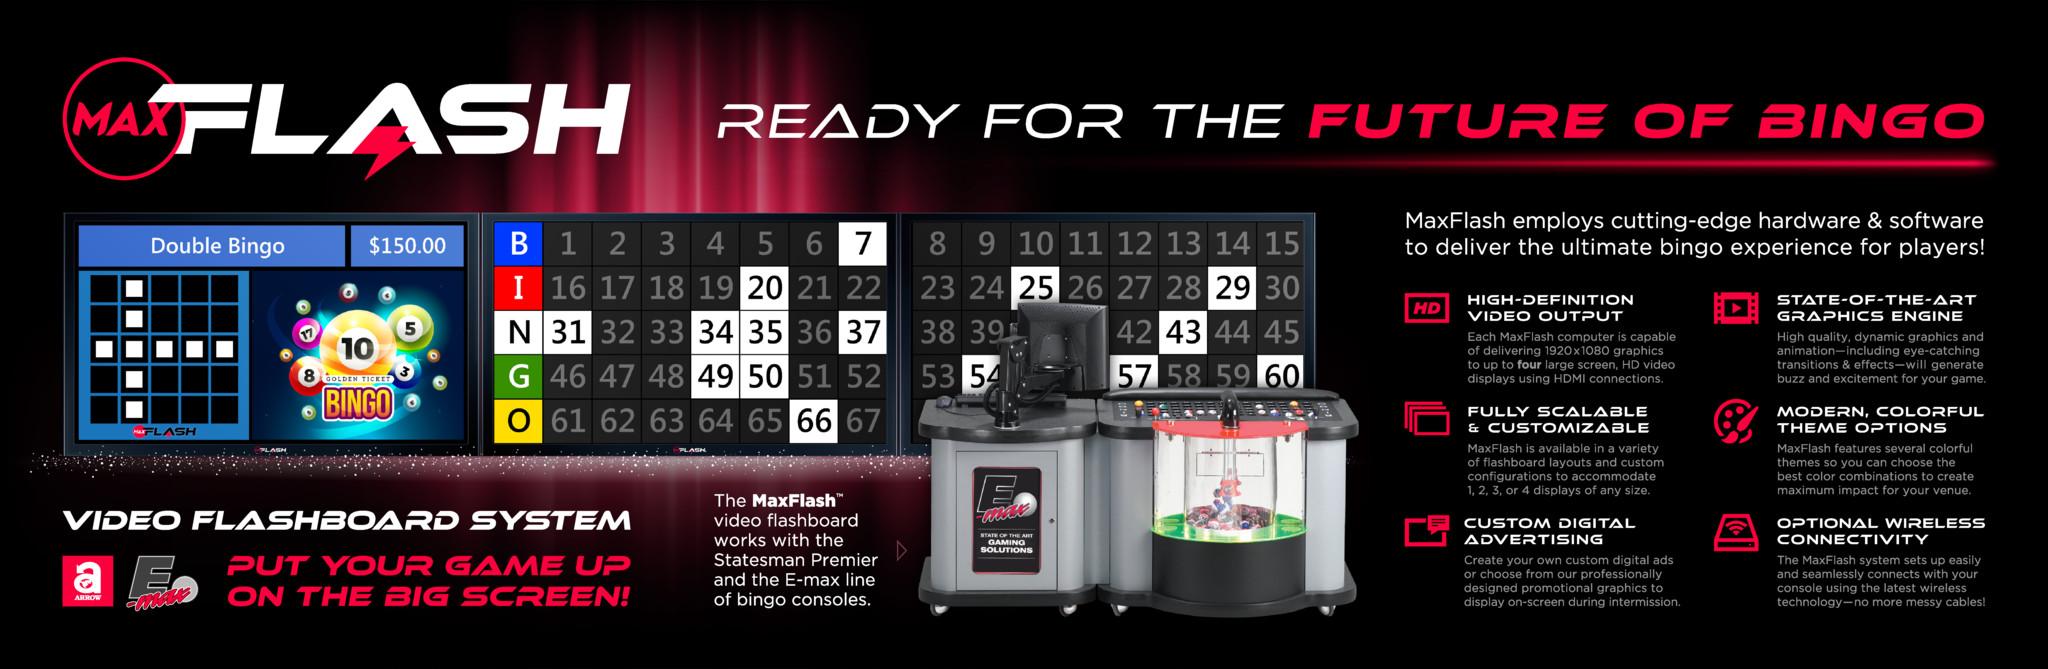 MaxFlash Brochure Promotional Materials/Equipment Flyers & Brochures